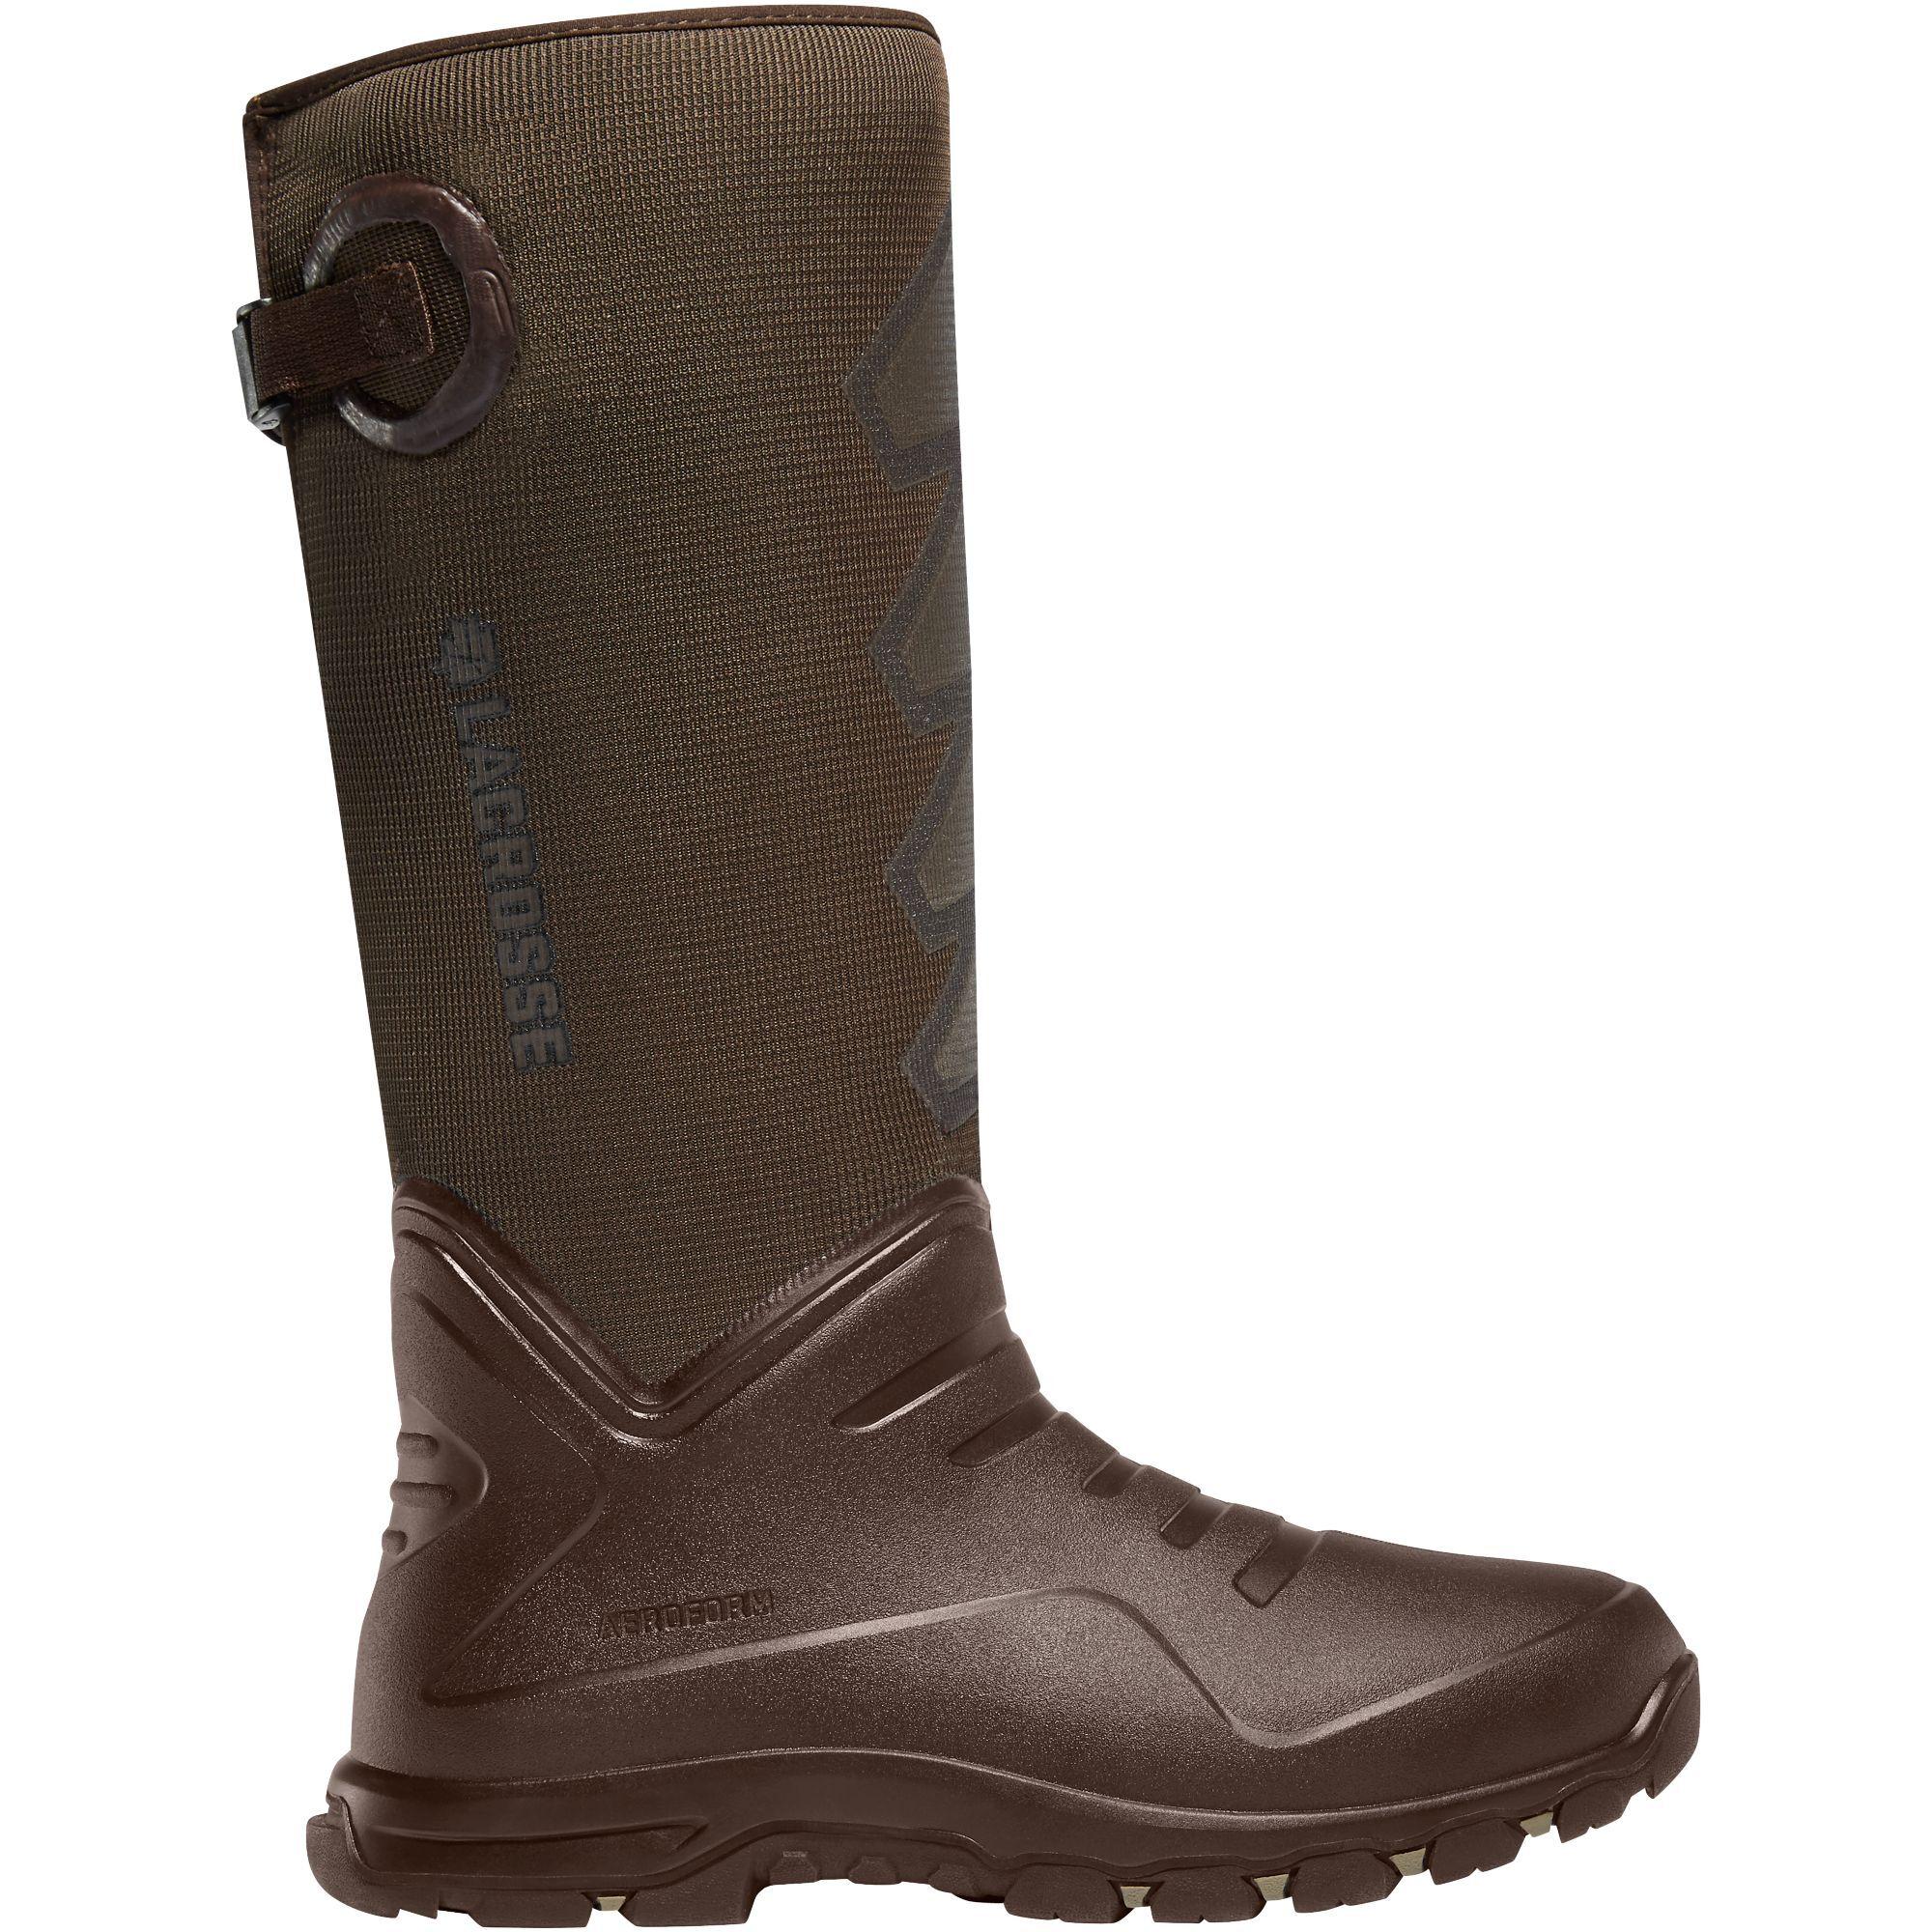 "LaCrosse AeroHead Sport 16"" 7mm Boots (9)- Brown"